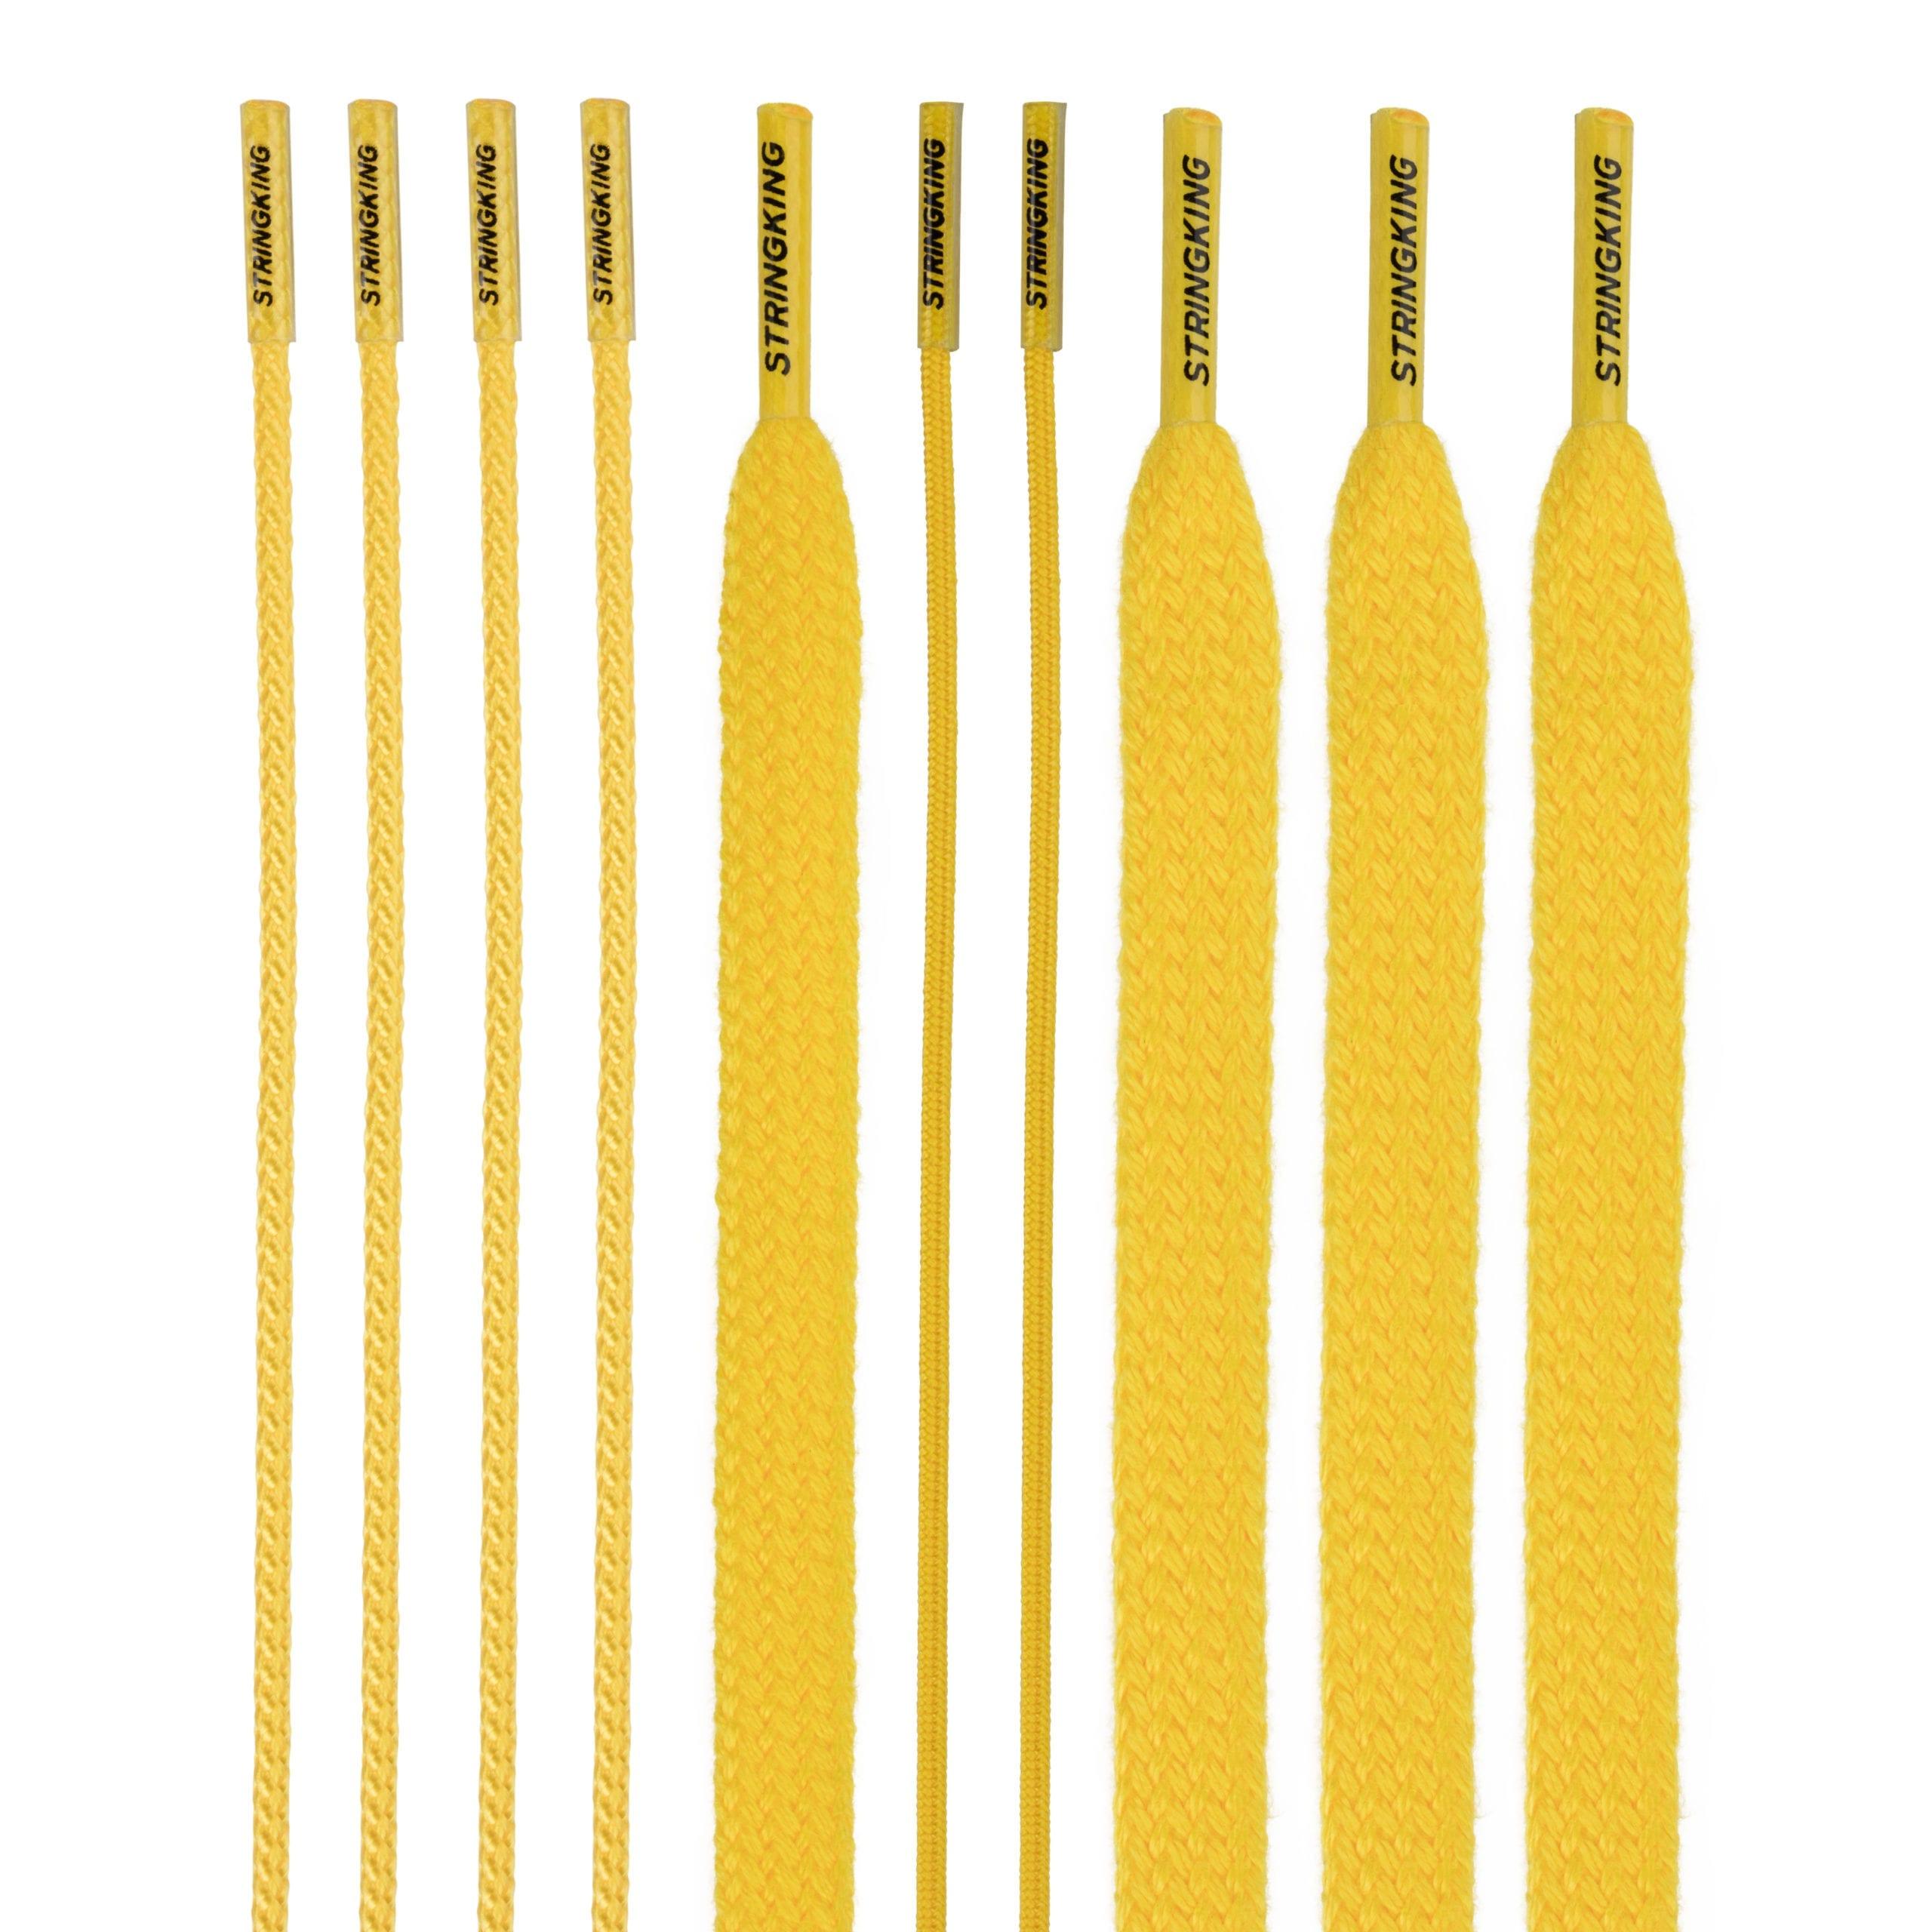 string-kit-BB-retailers-yellow-scaled-1.jpg